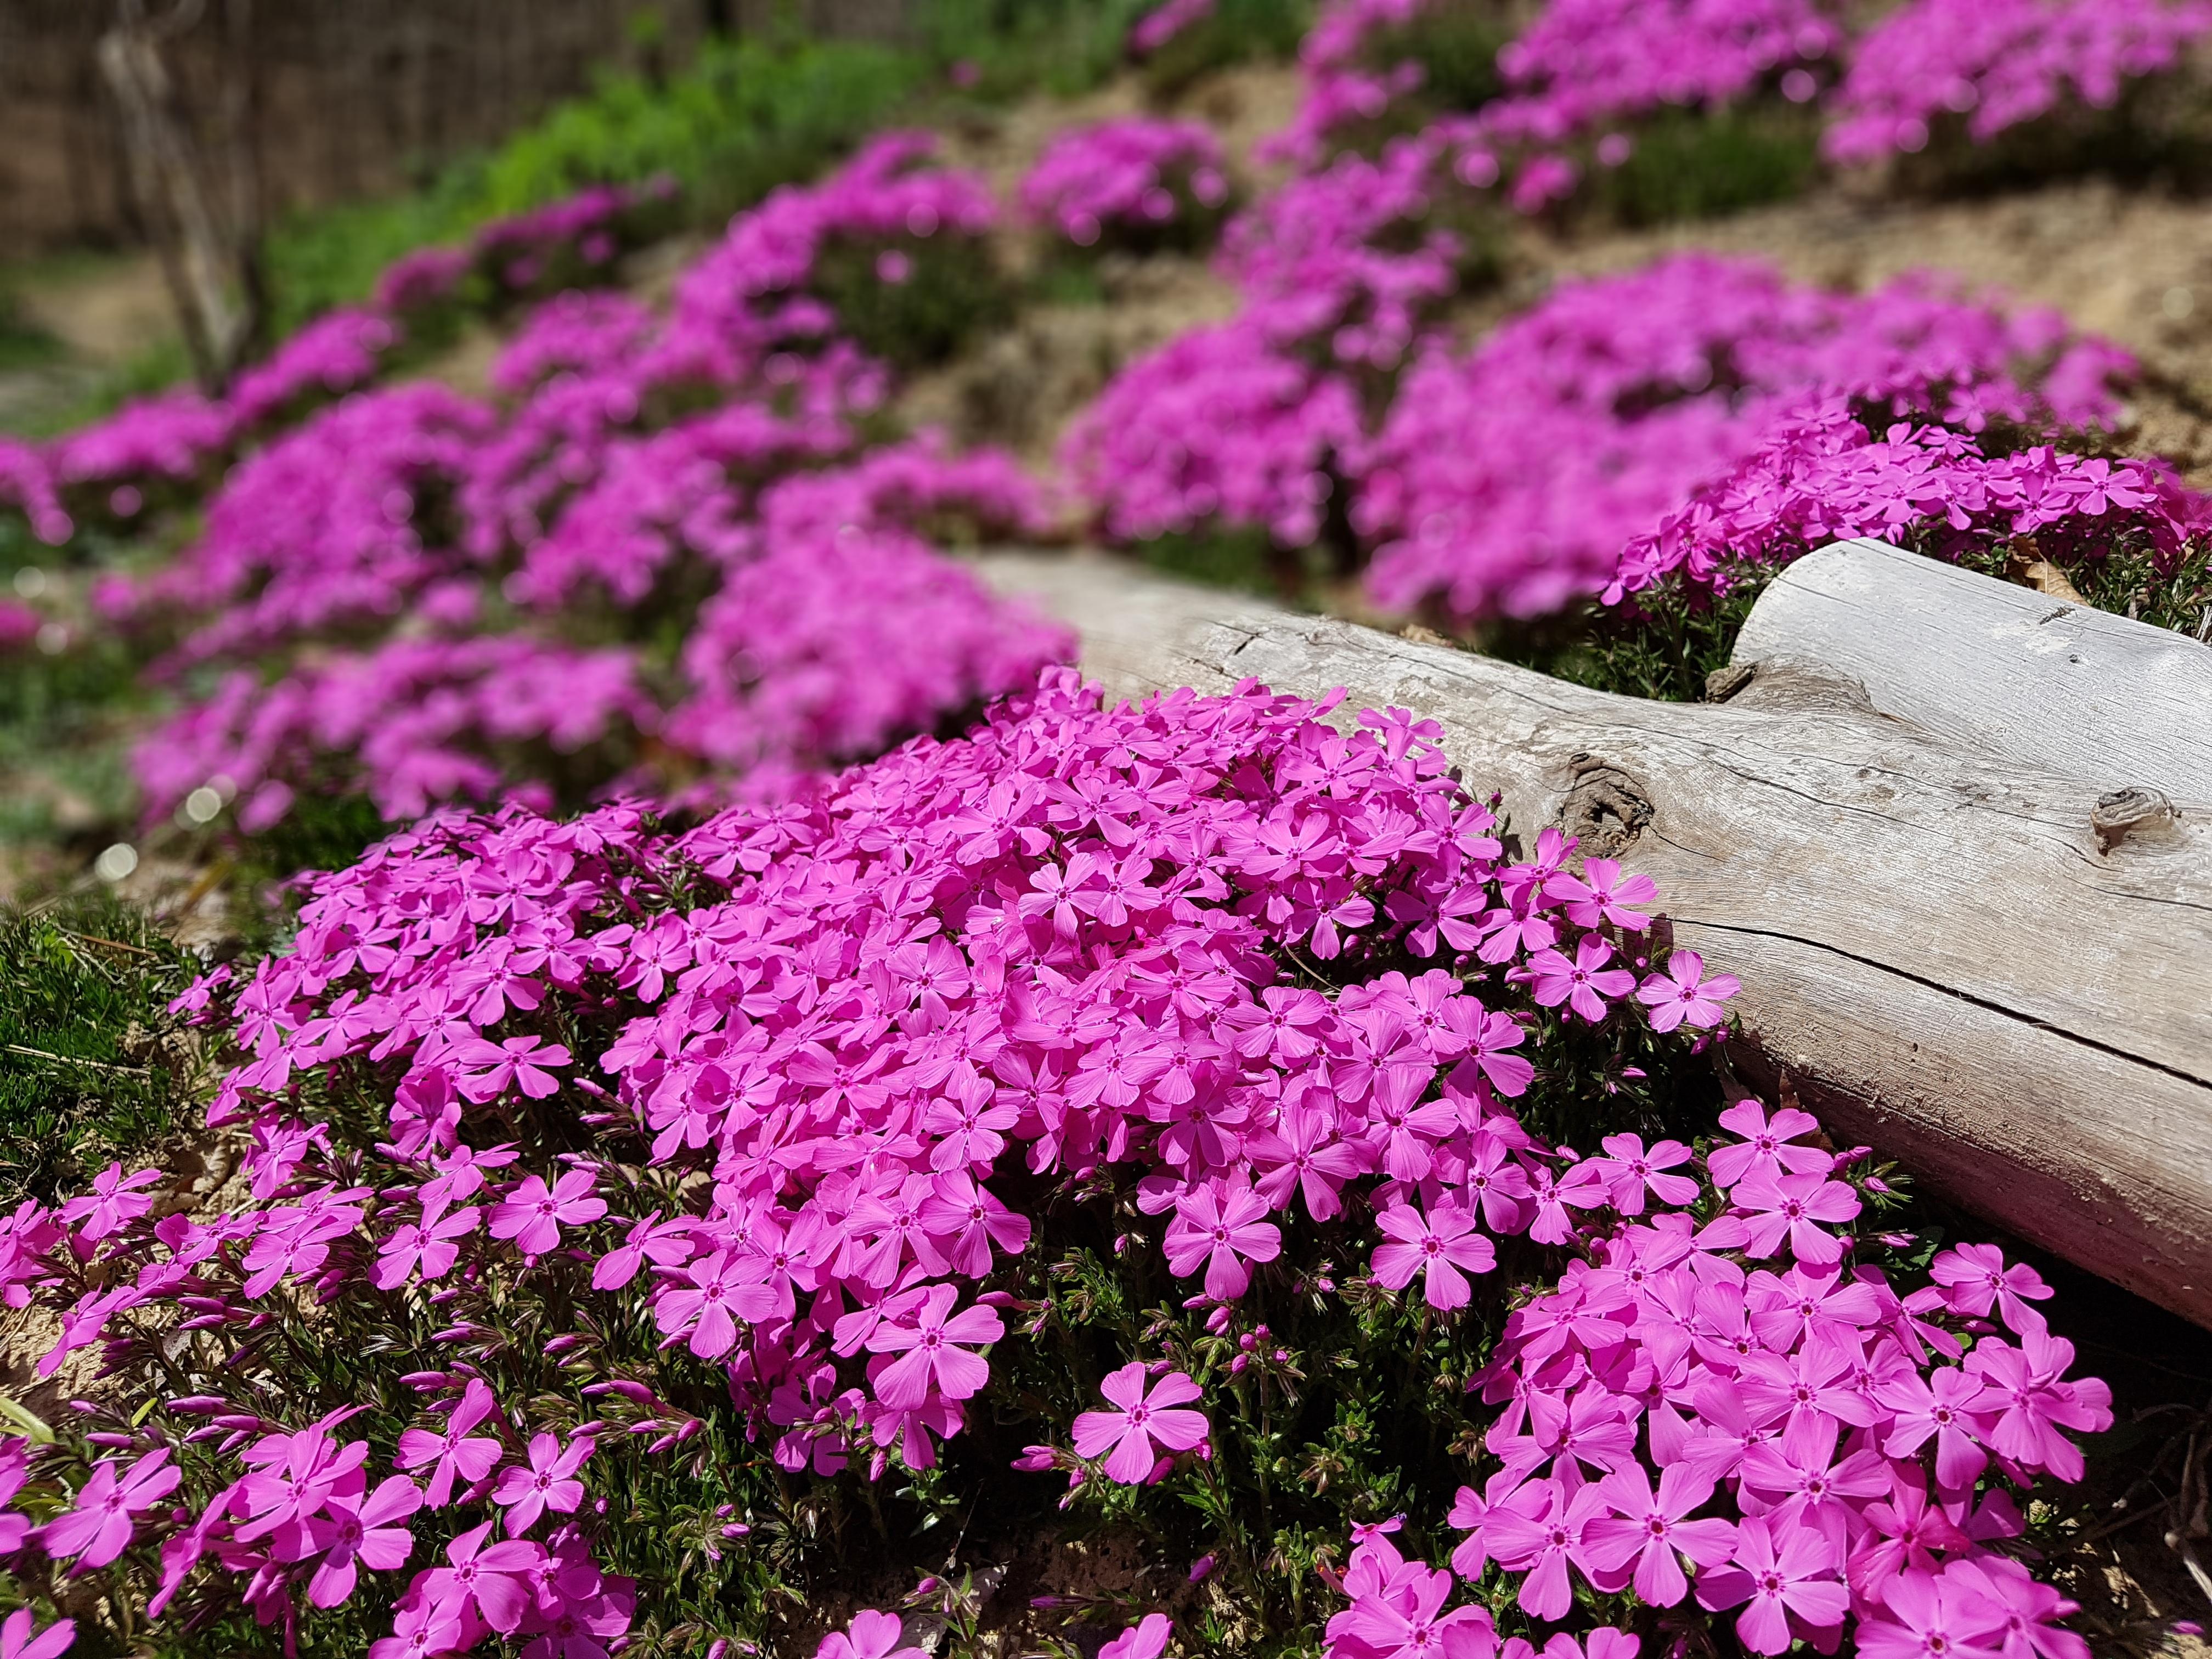 Free Images Lawn Botany Garden Flora Shrub Groundcover